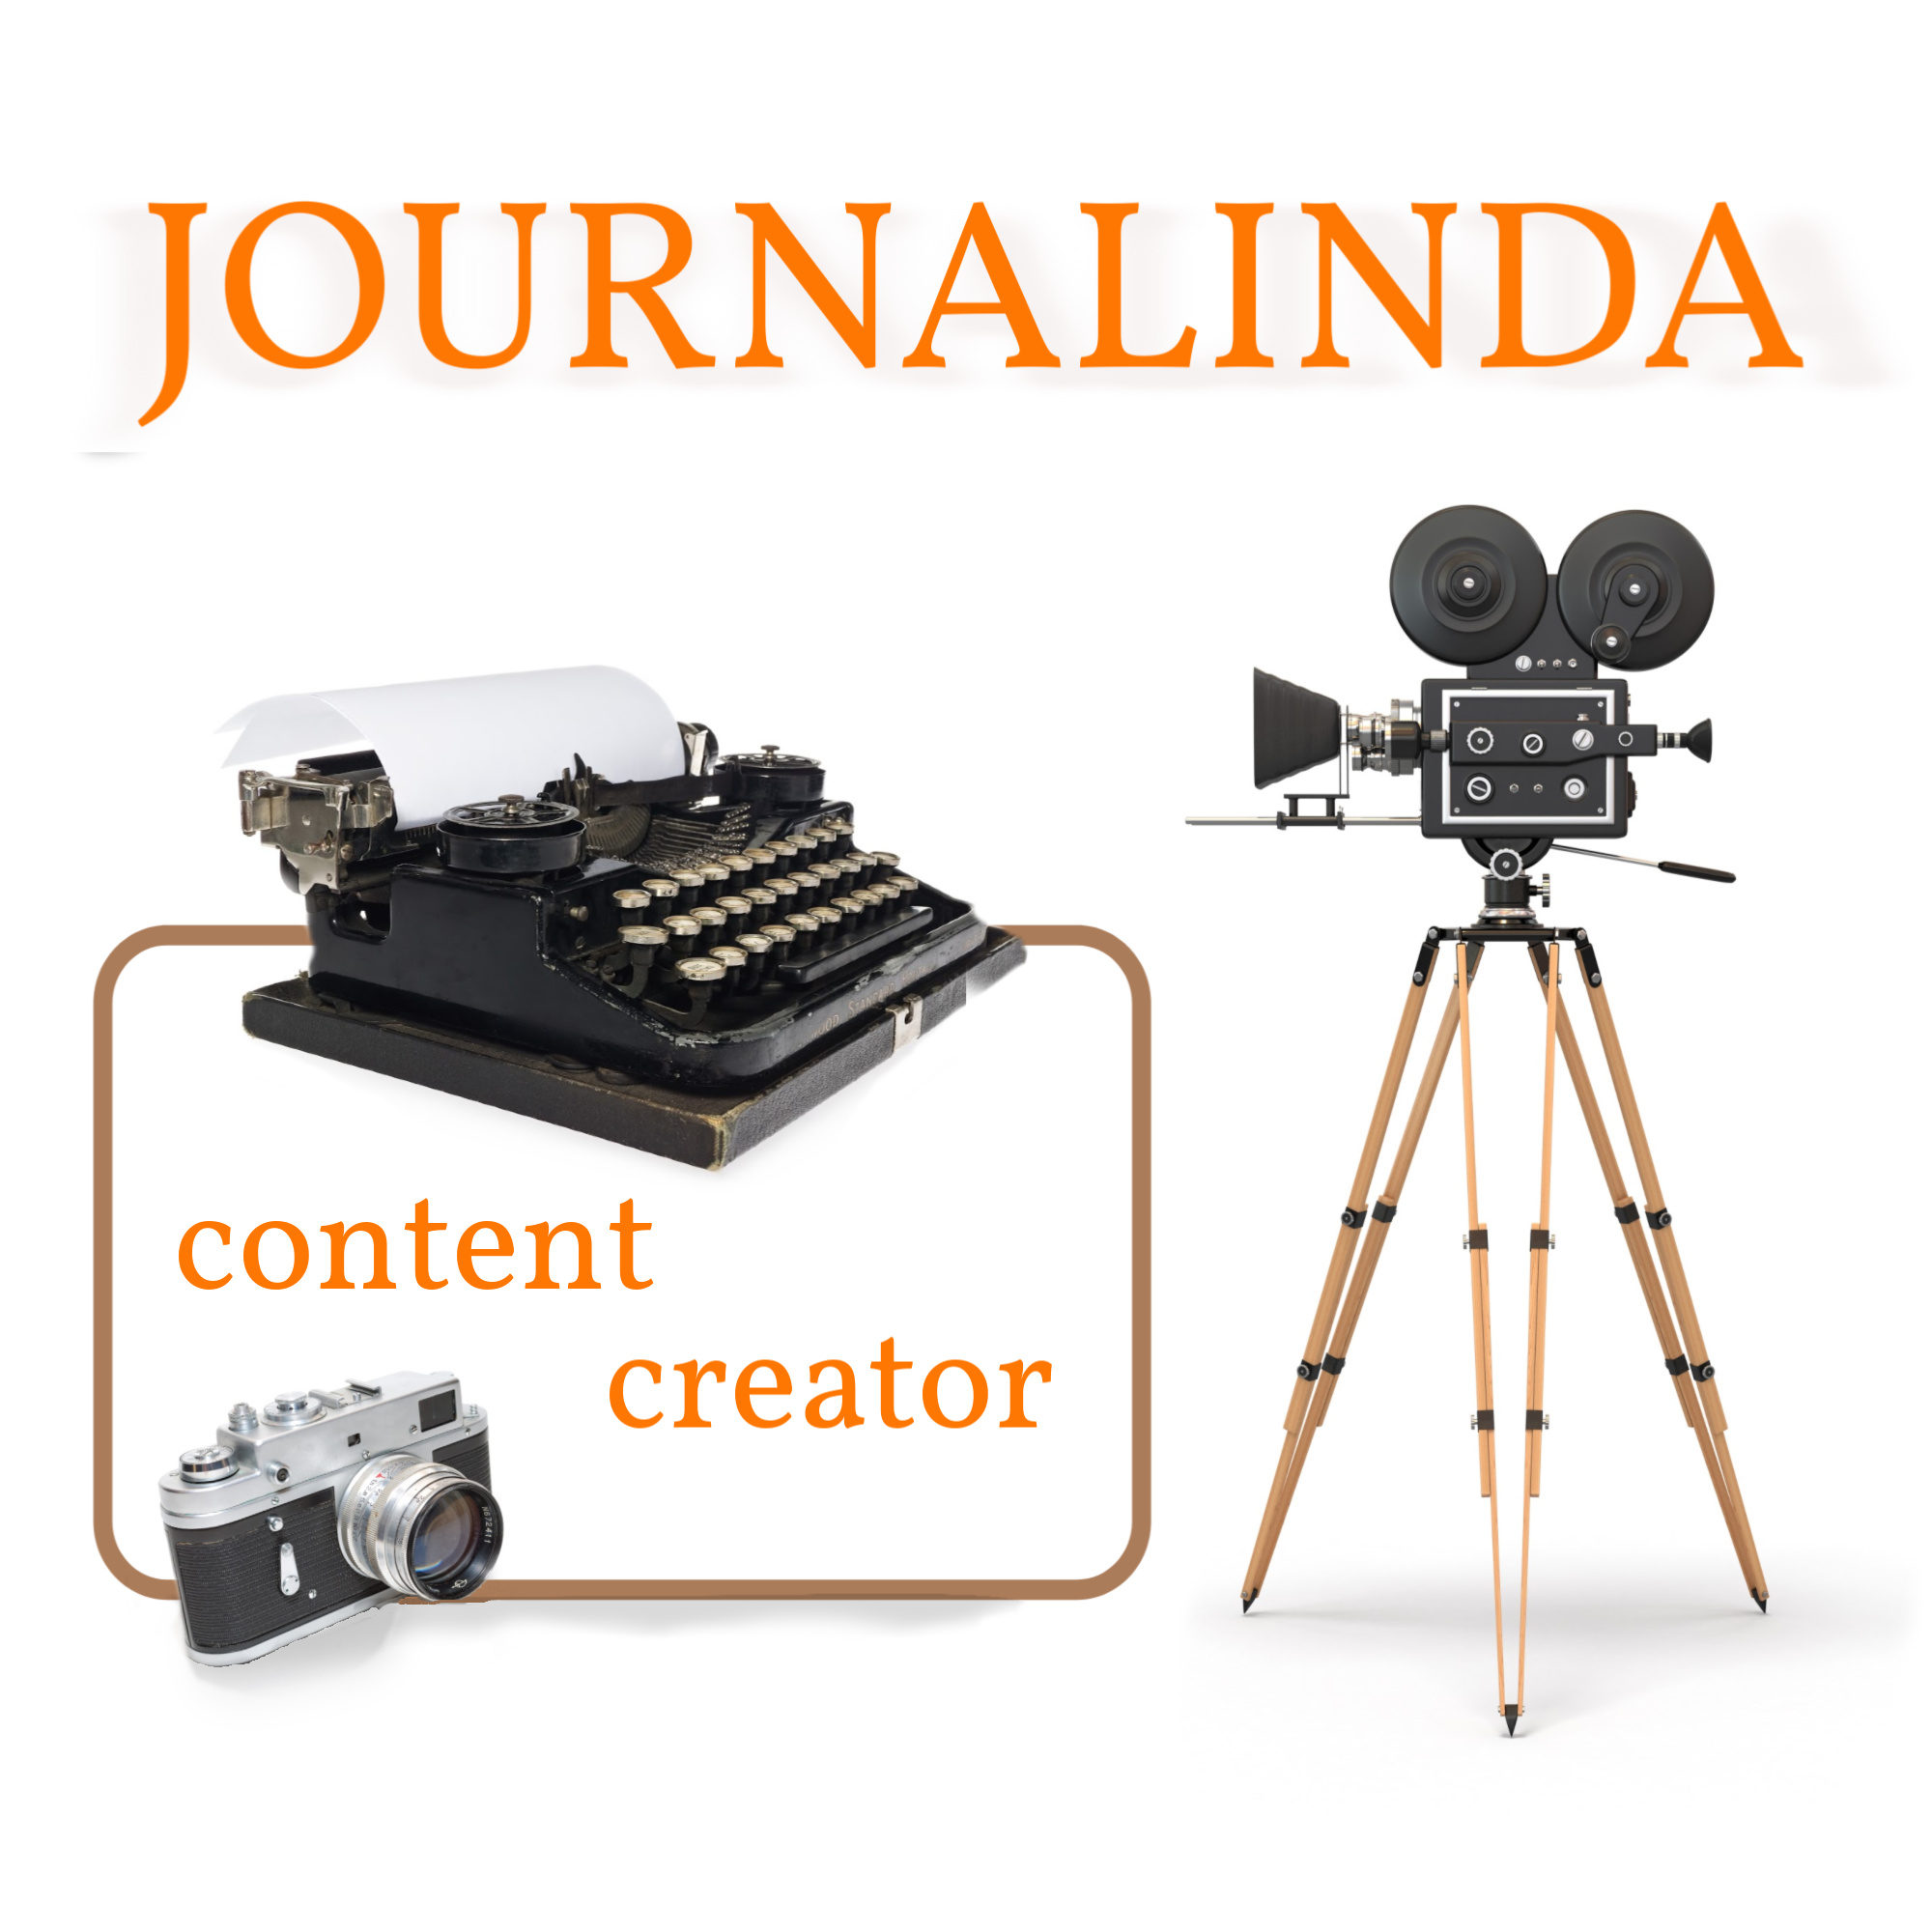 Journalinda